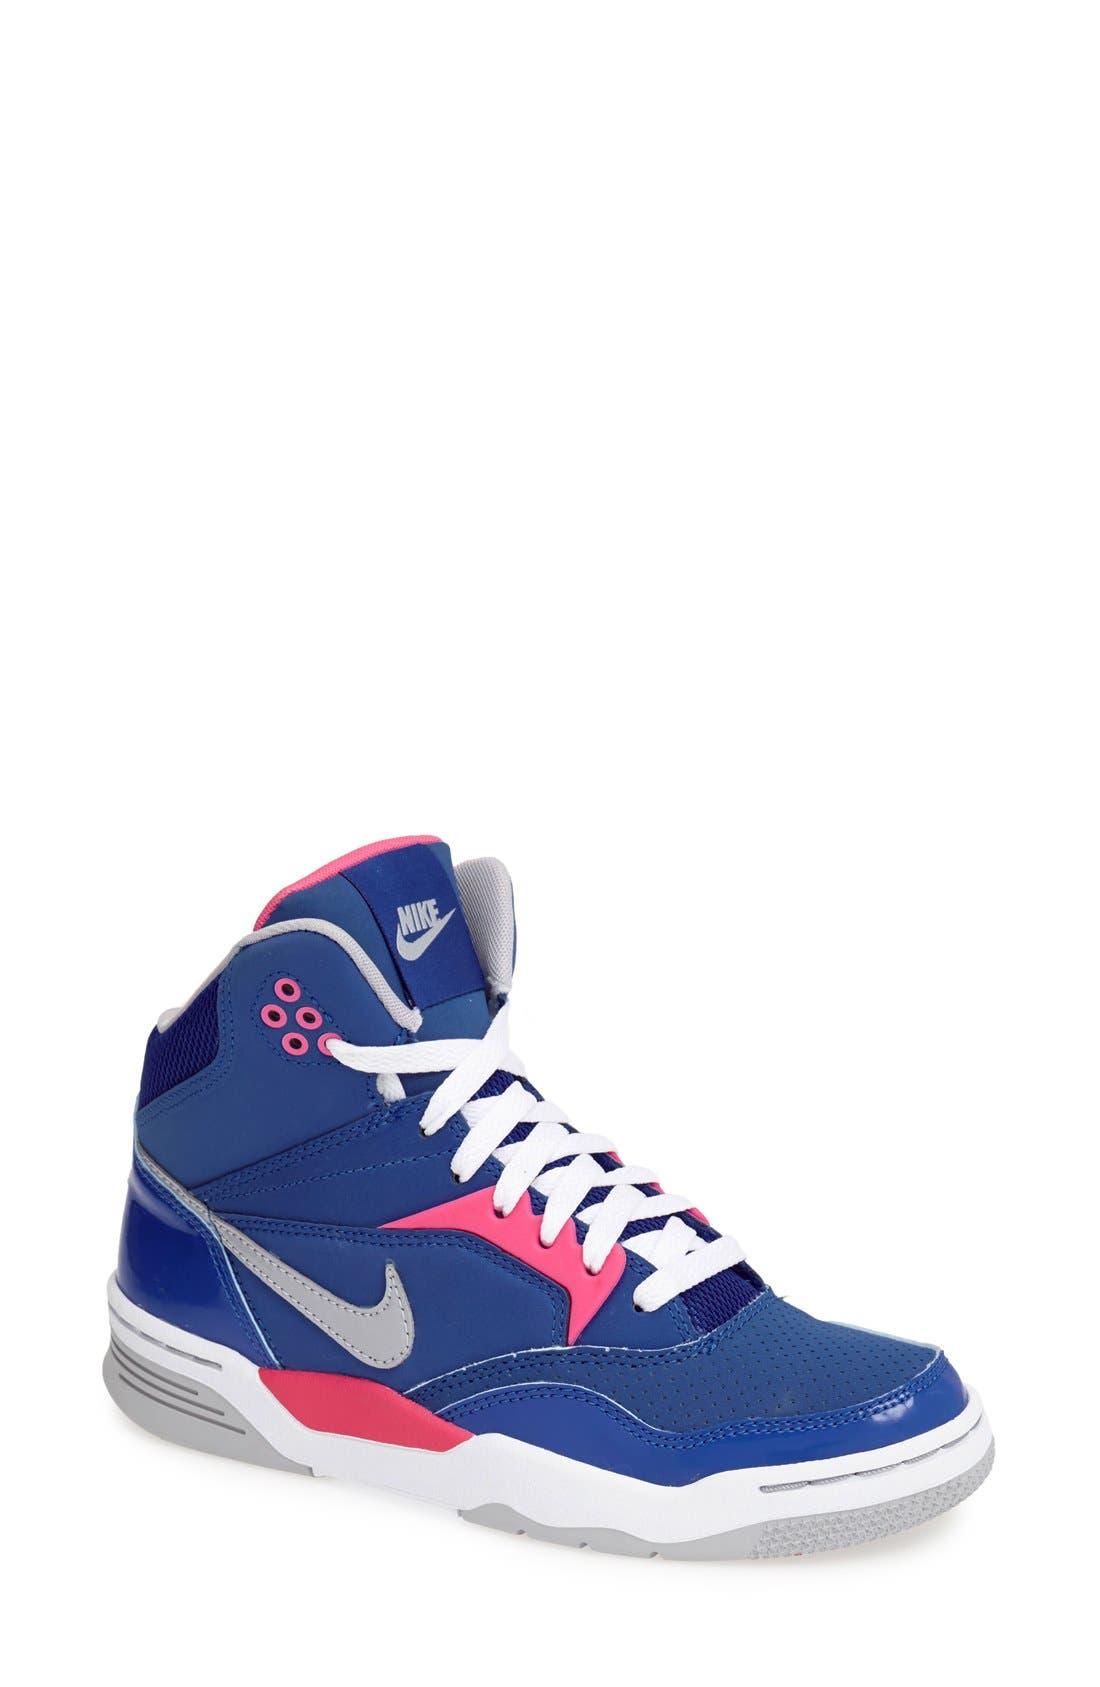 Main Image - Nike 'Base Flight 14 Hi' Sneaker (Women)